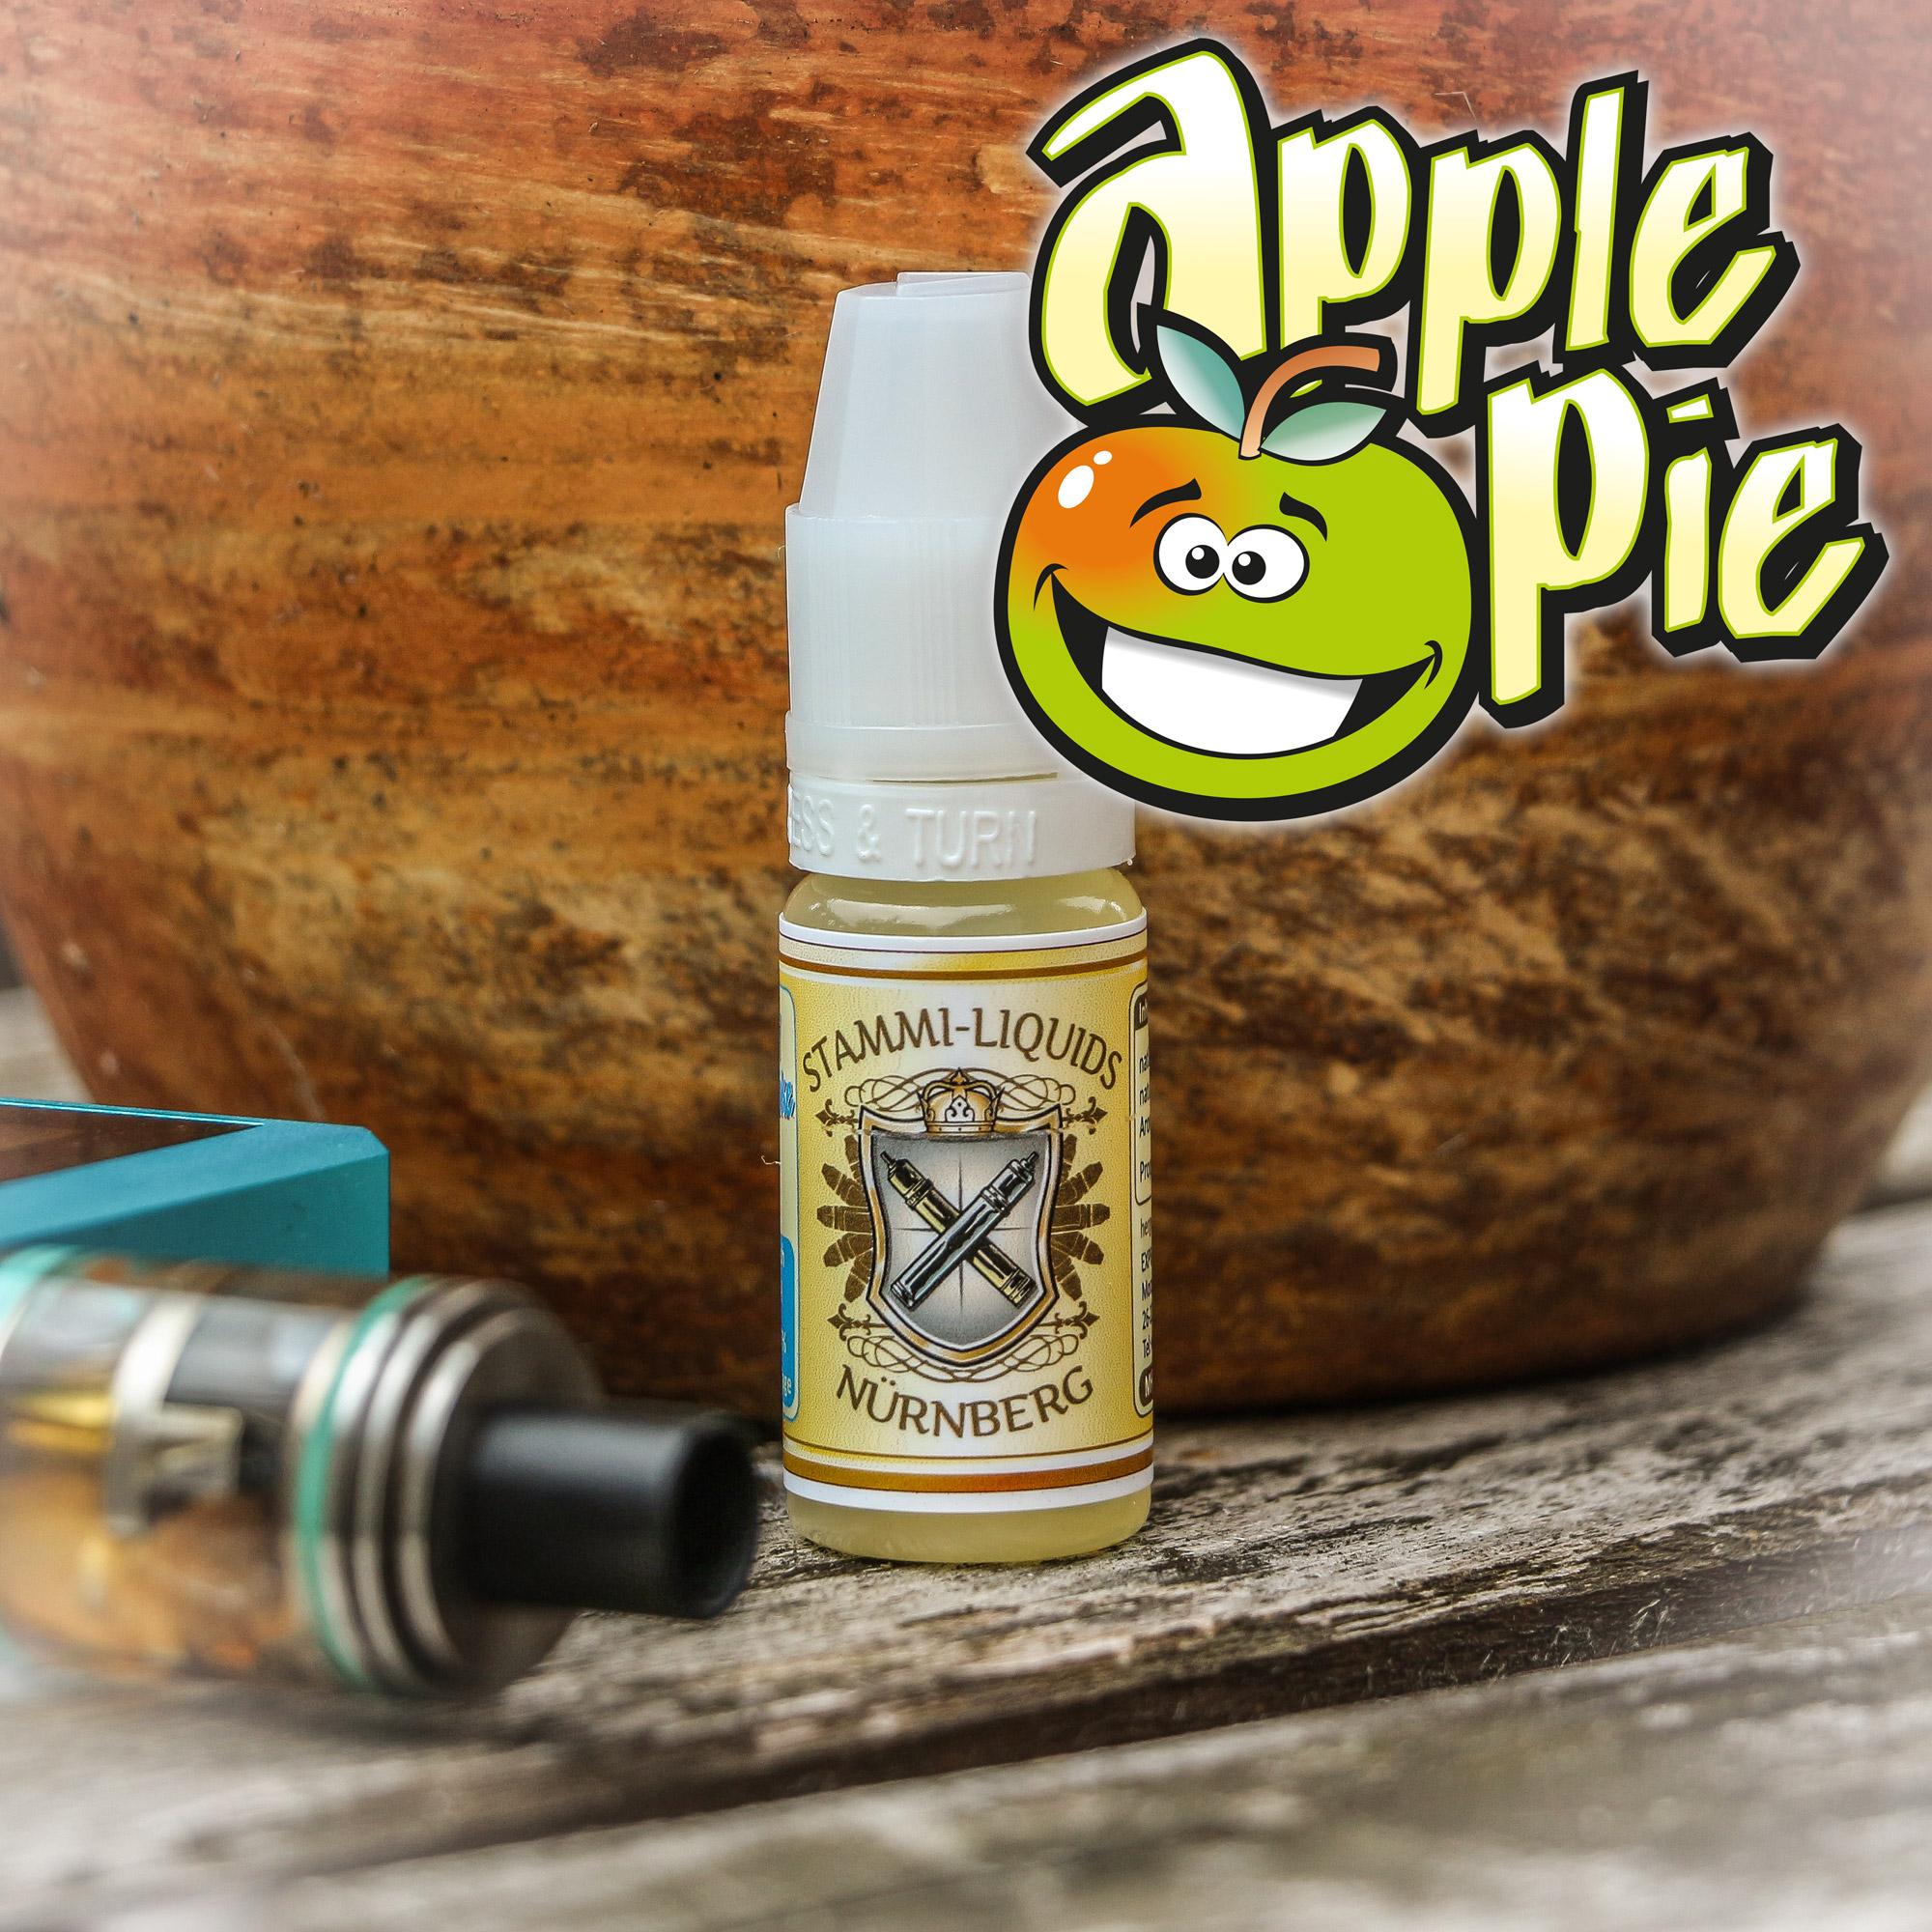 stammi liquids aroma apple pie alpha steam e zigaretten liquids zubeh r online shop. Black Bedroom Furniture Sets. Home Design Ideas